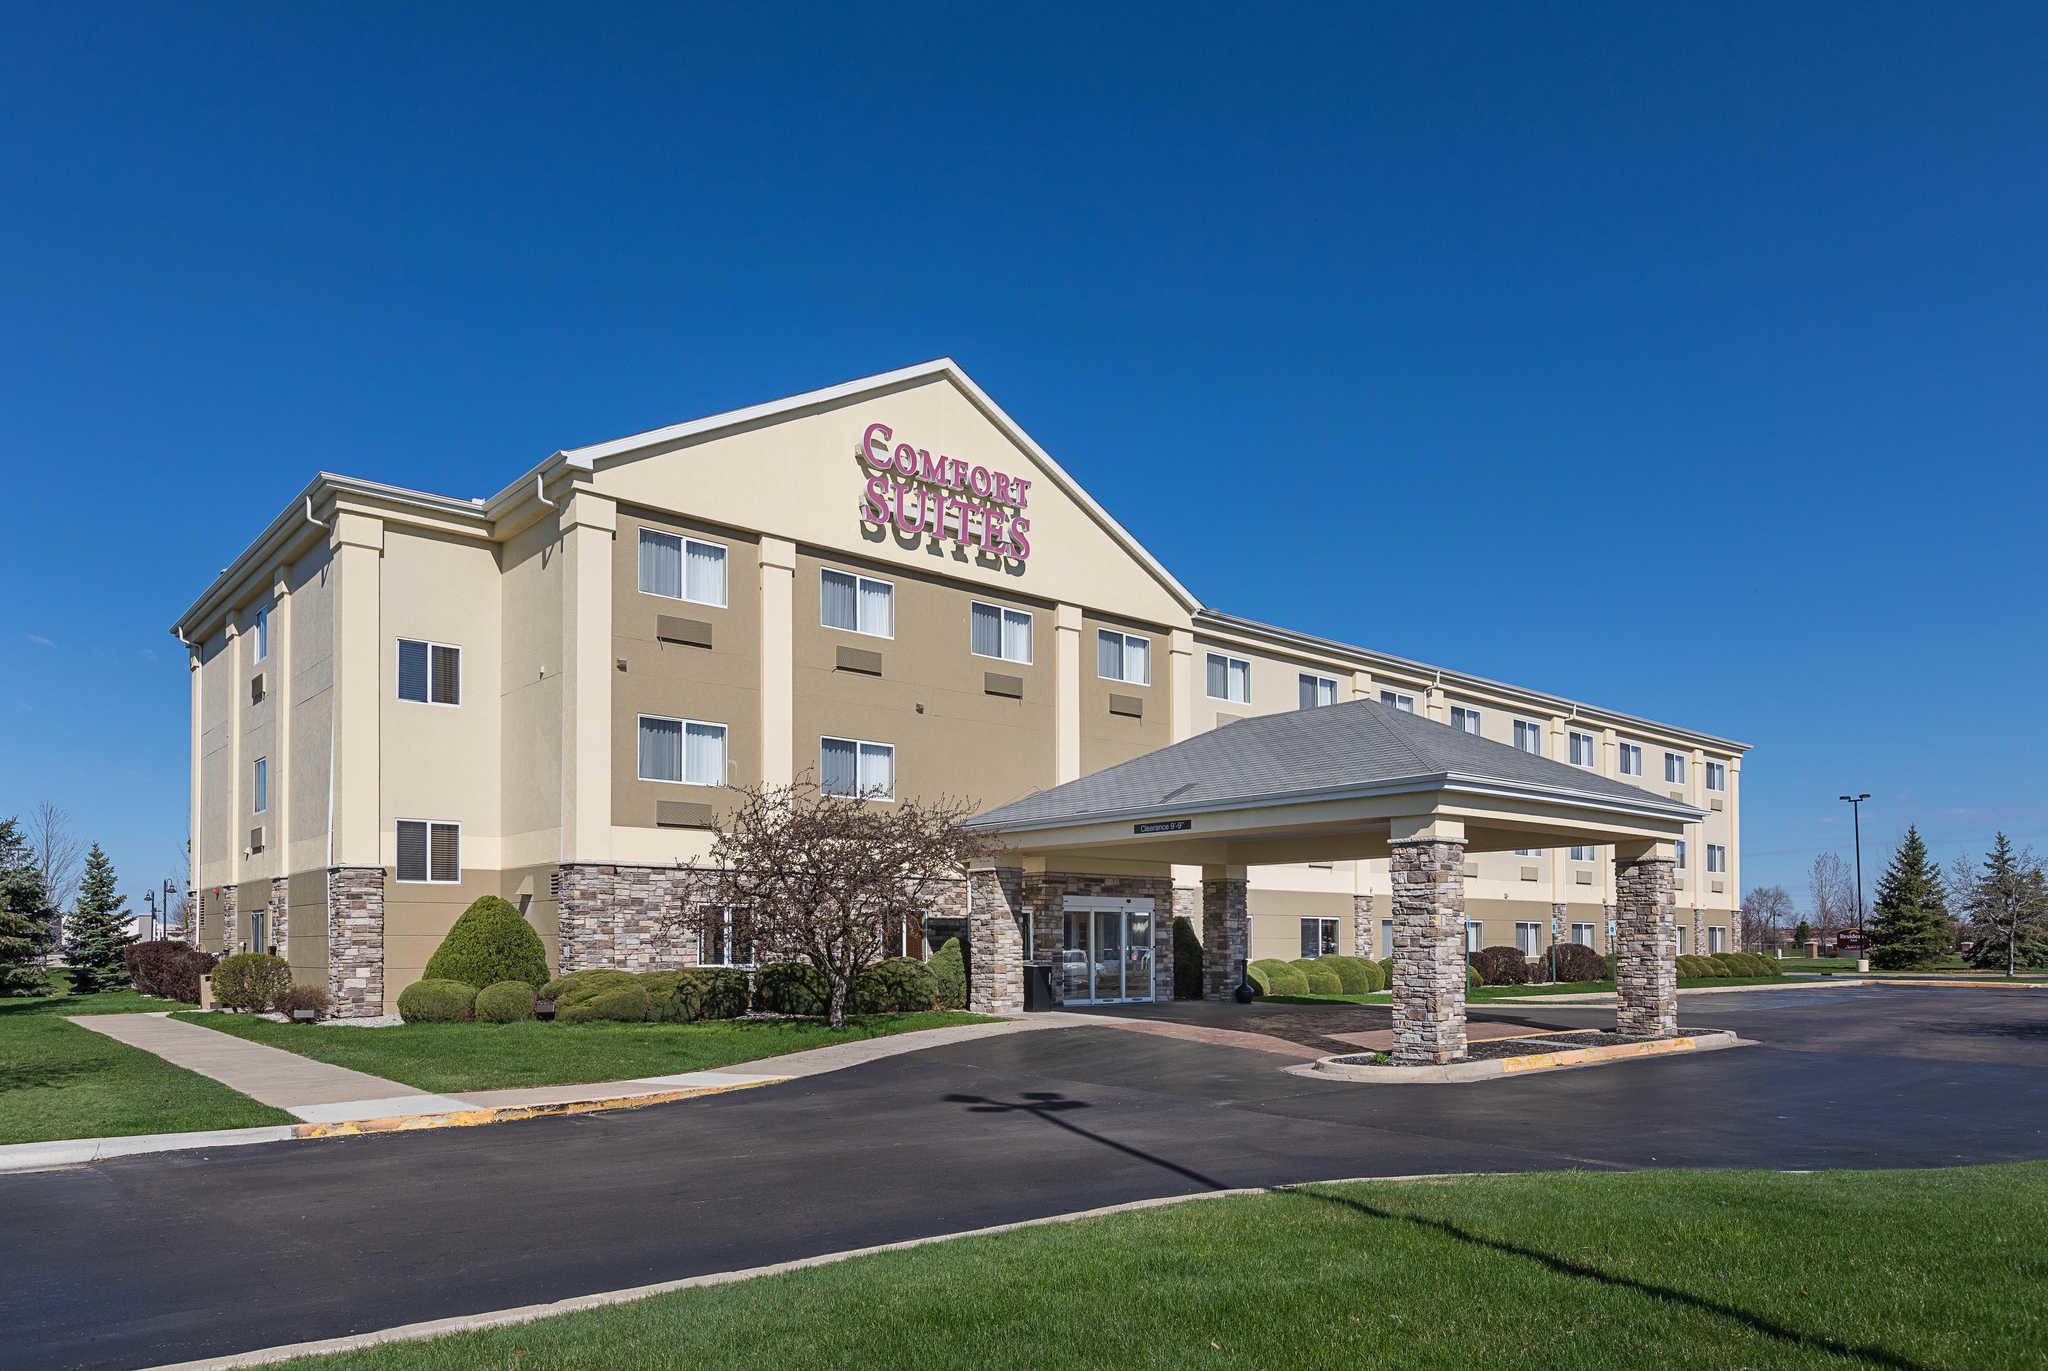 Hotels And Motels In Saginaw Michigan